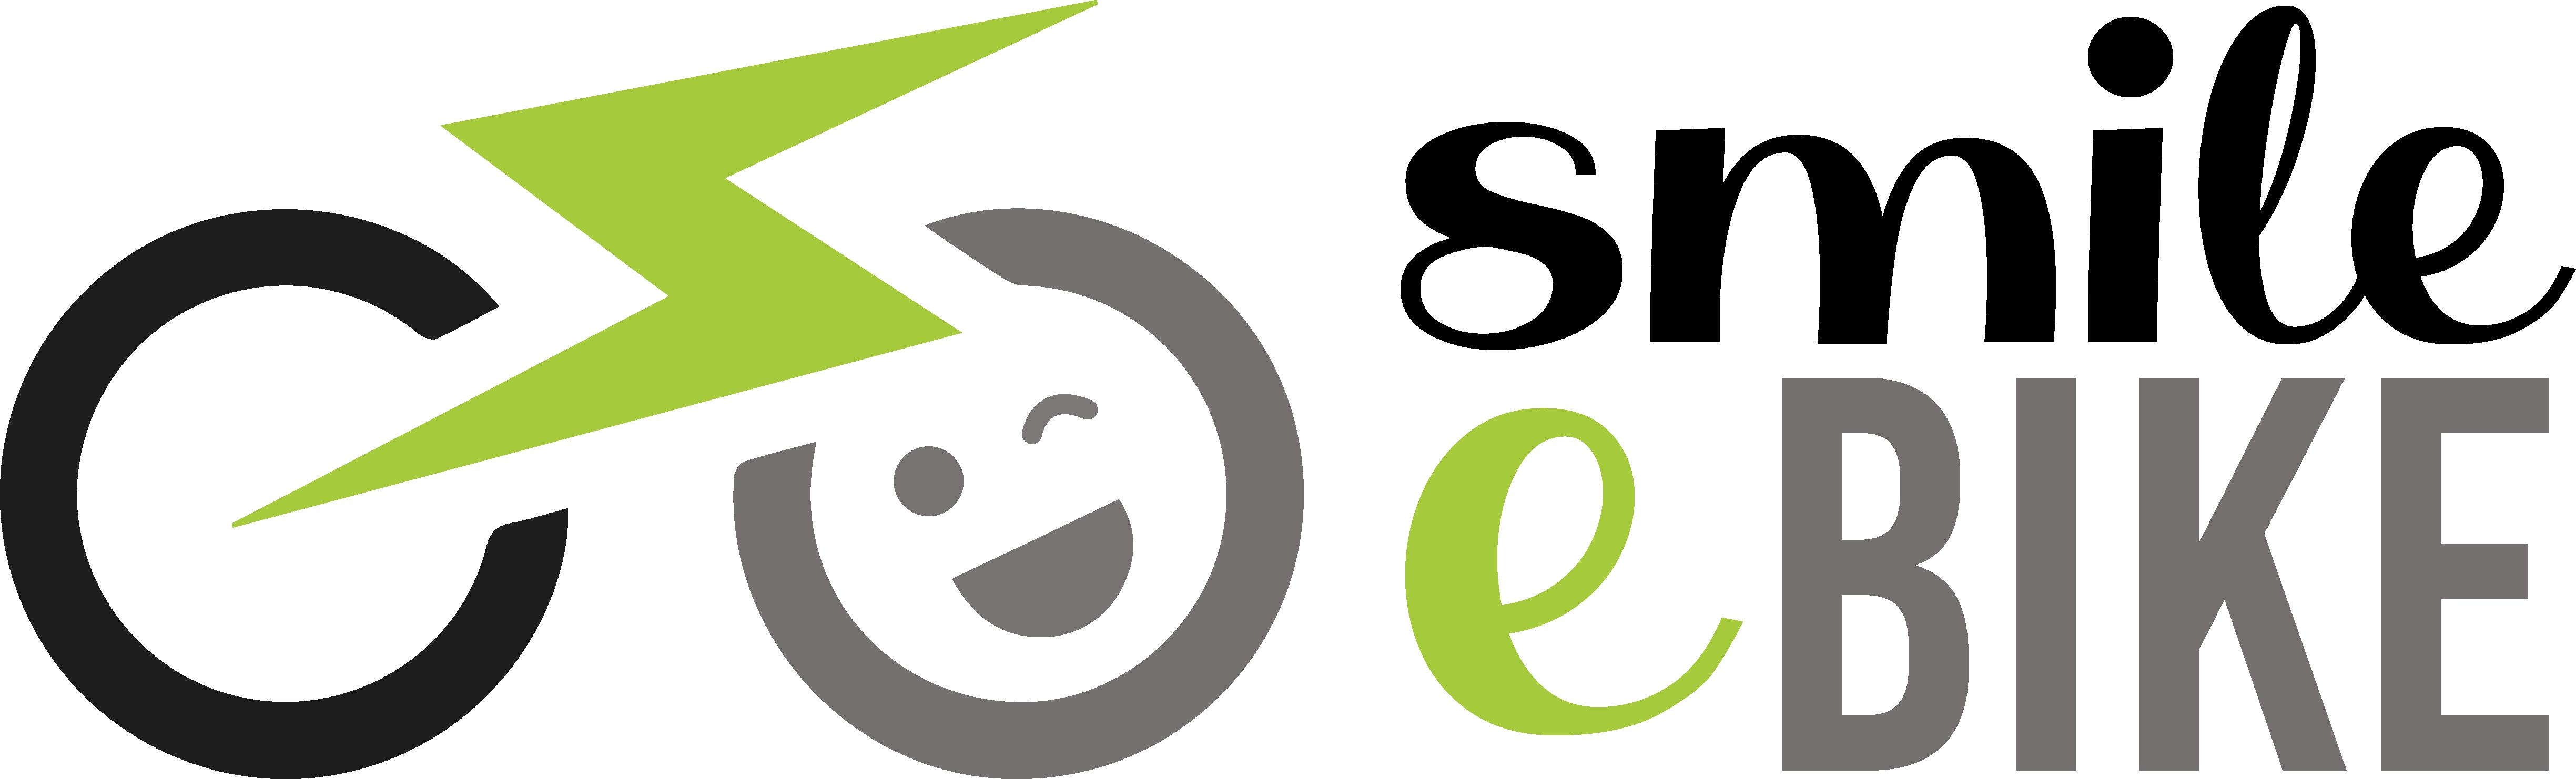 logo smile ebike